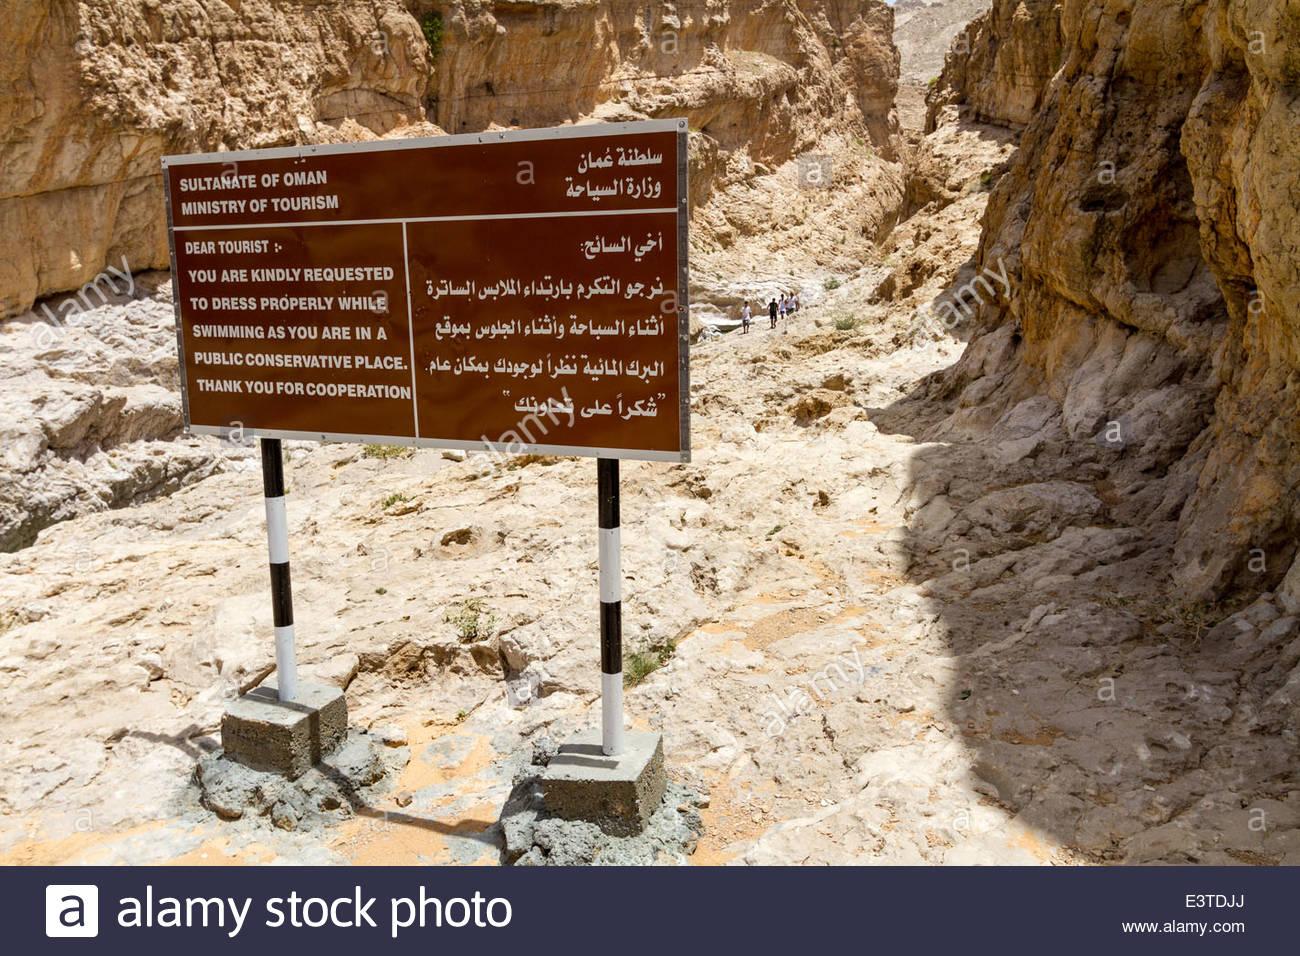 Sign board near canyon - Oman - Stock Image